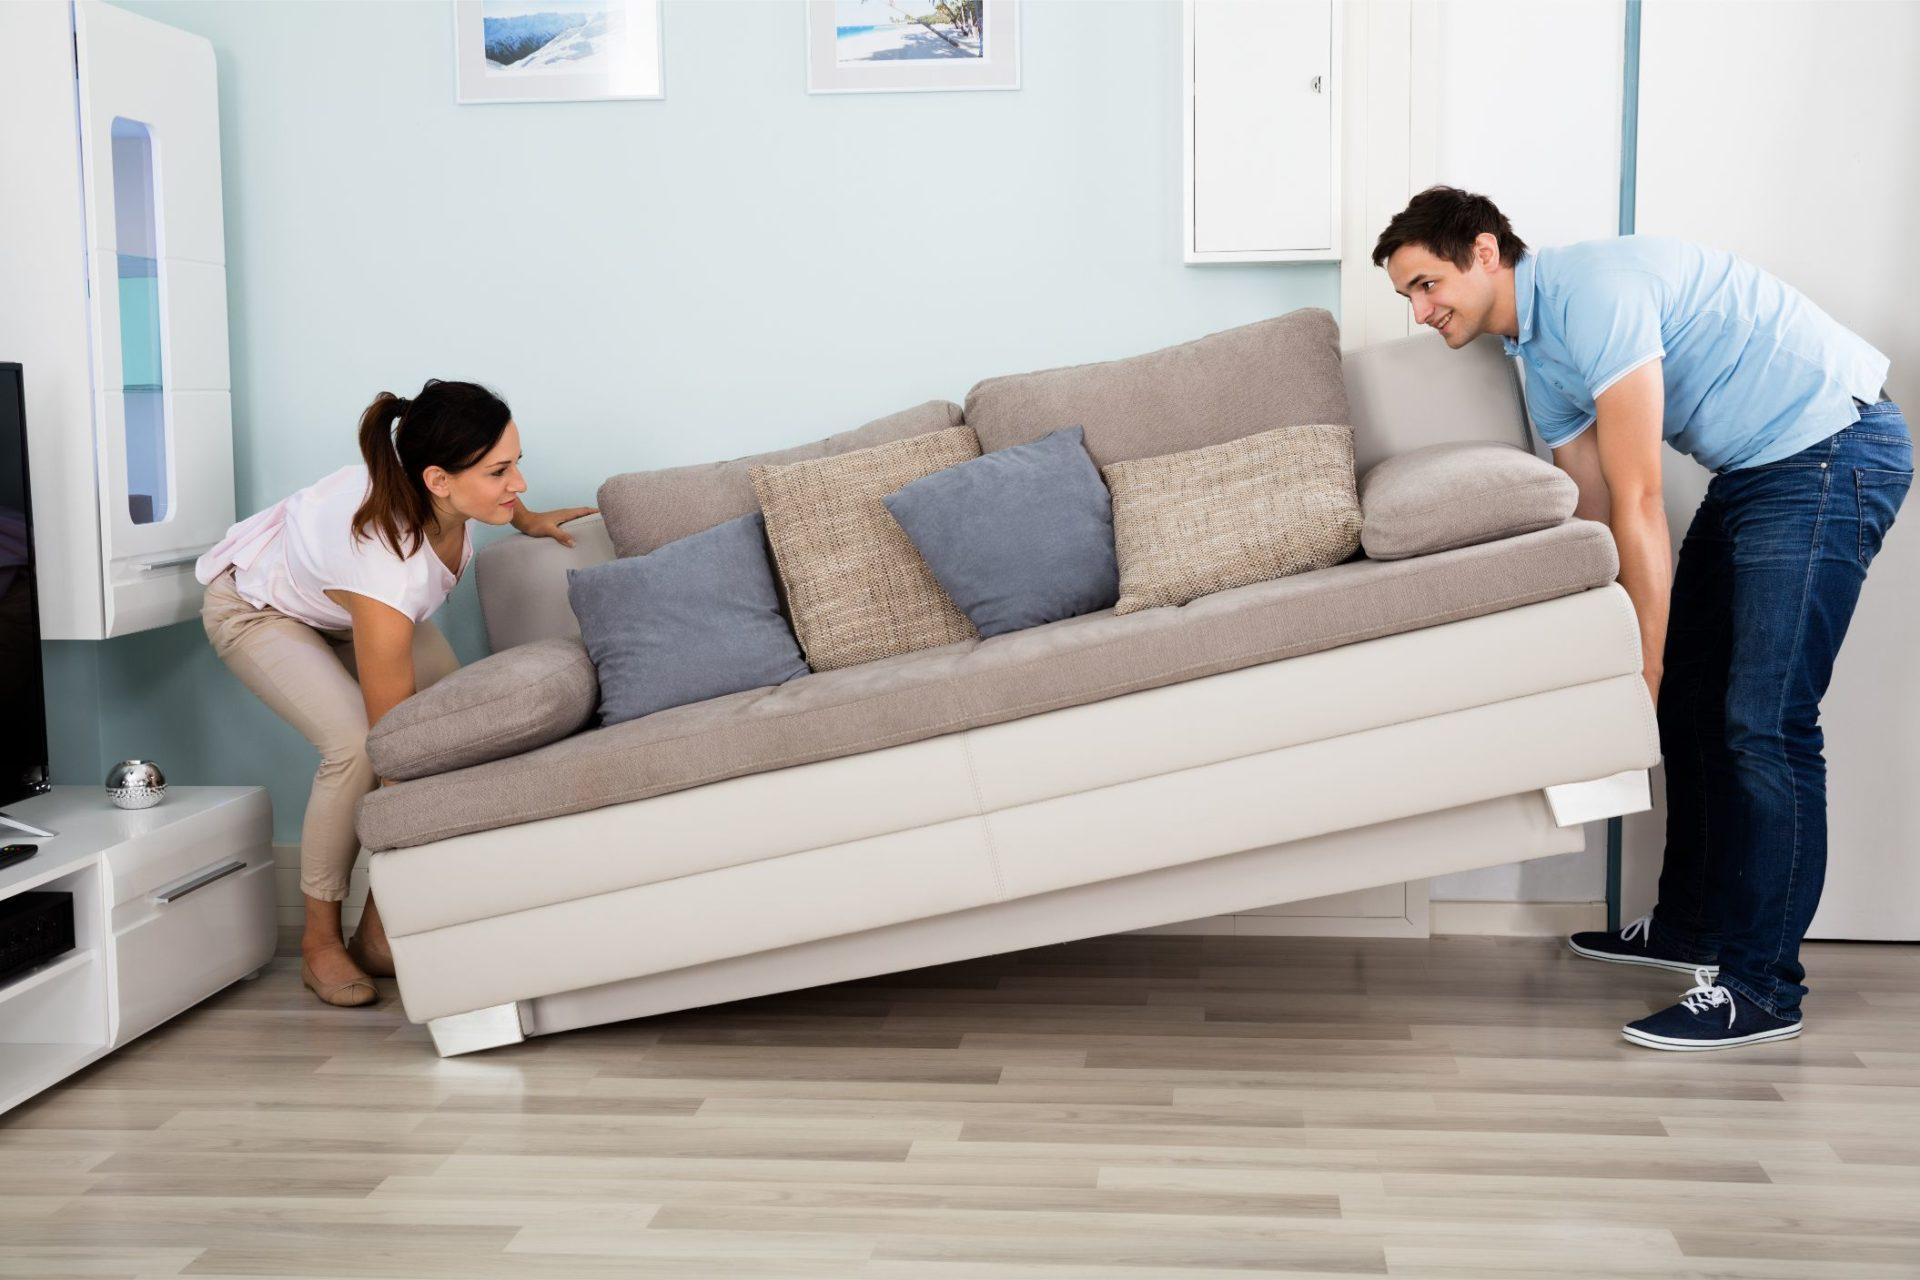 Pärchen trägt Couch